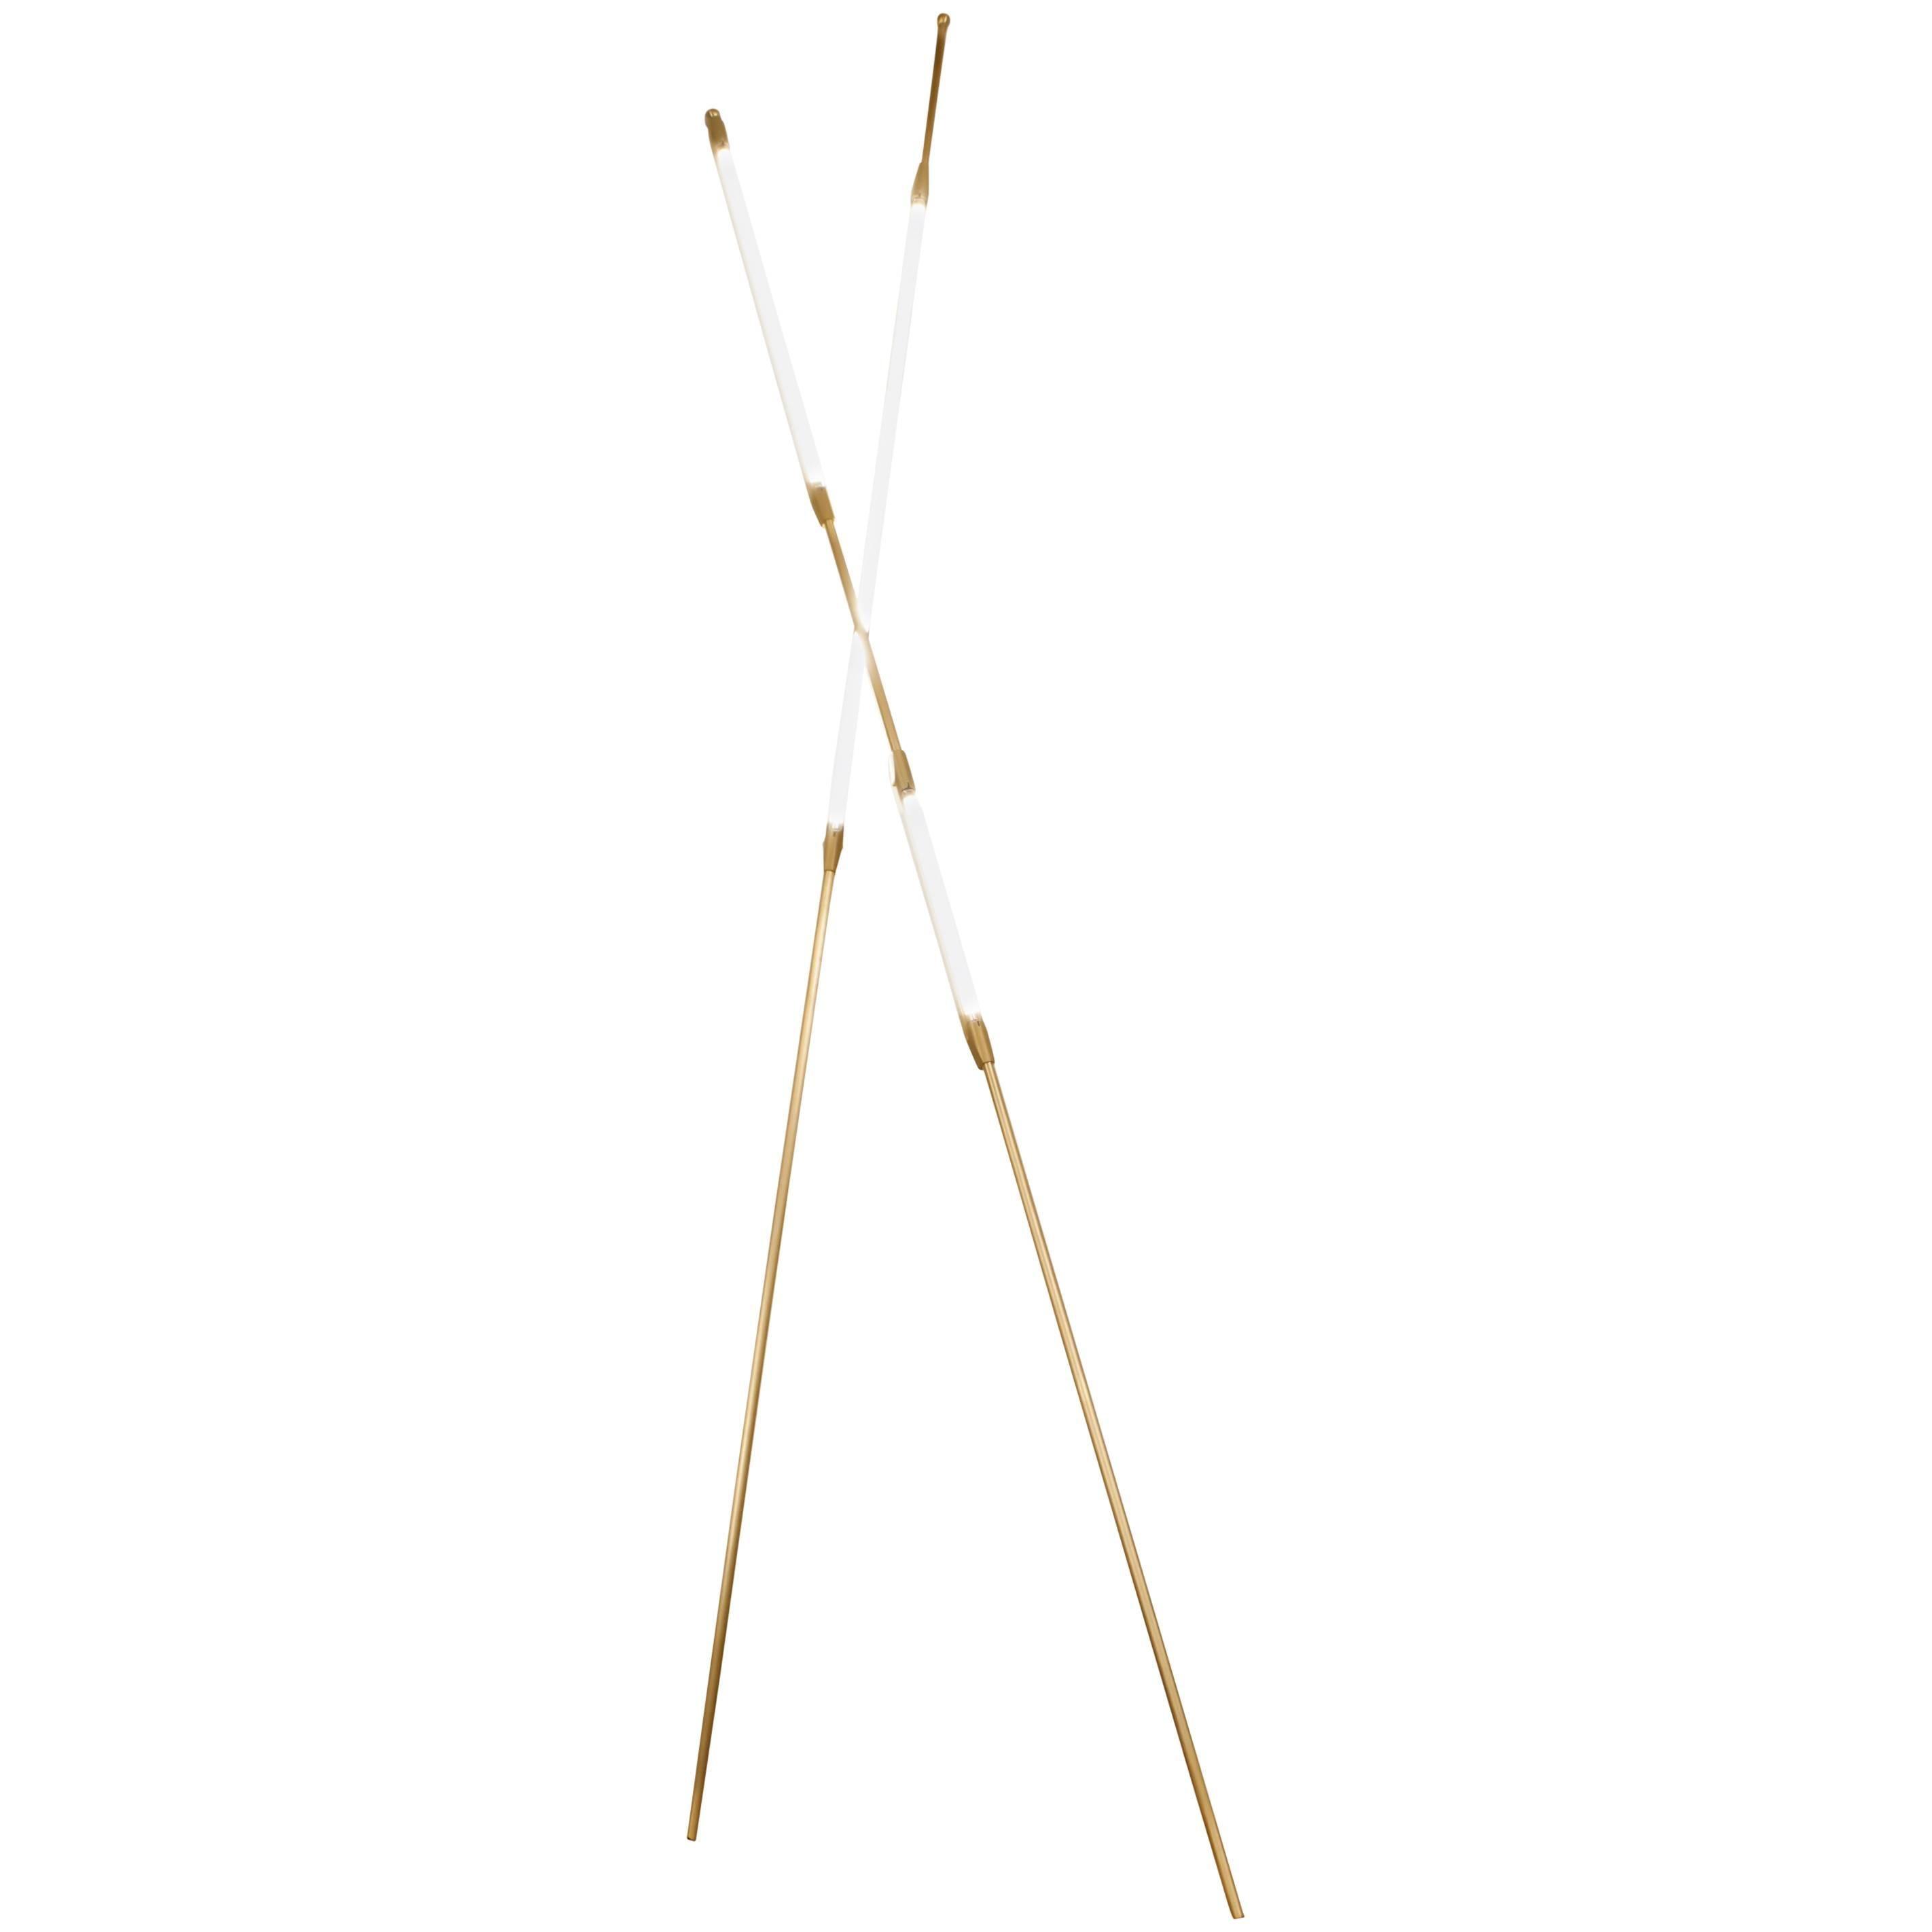 Bec Brittain Shy Beam Pair, Brass LED Floor Lamp